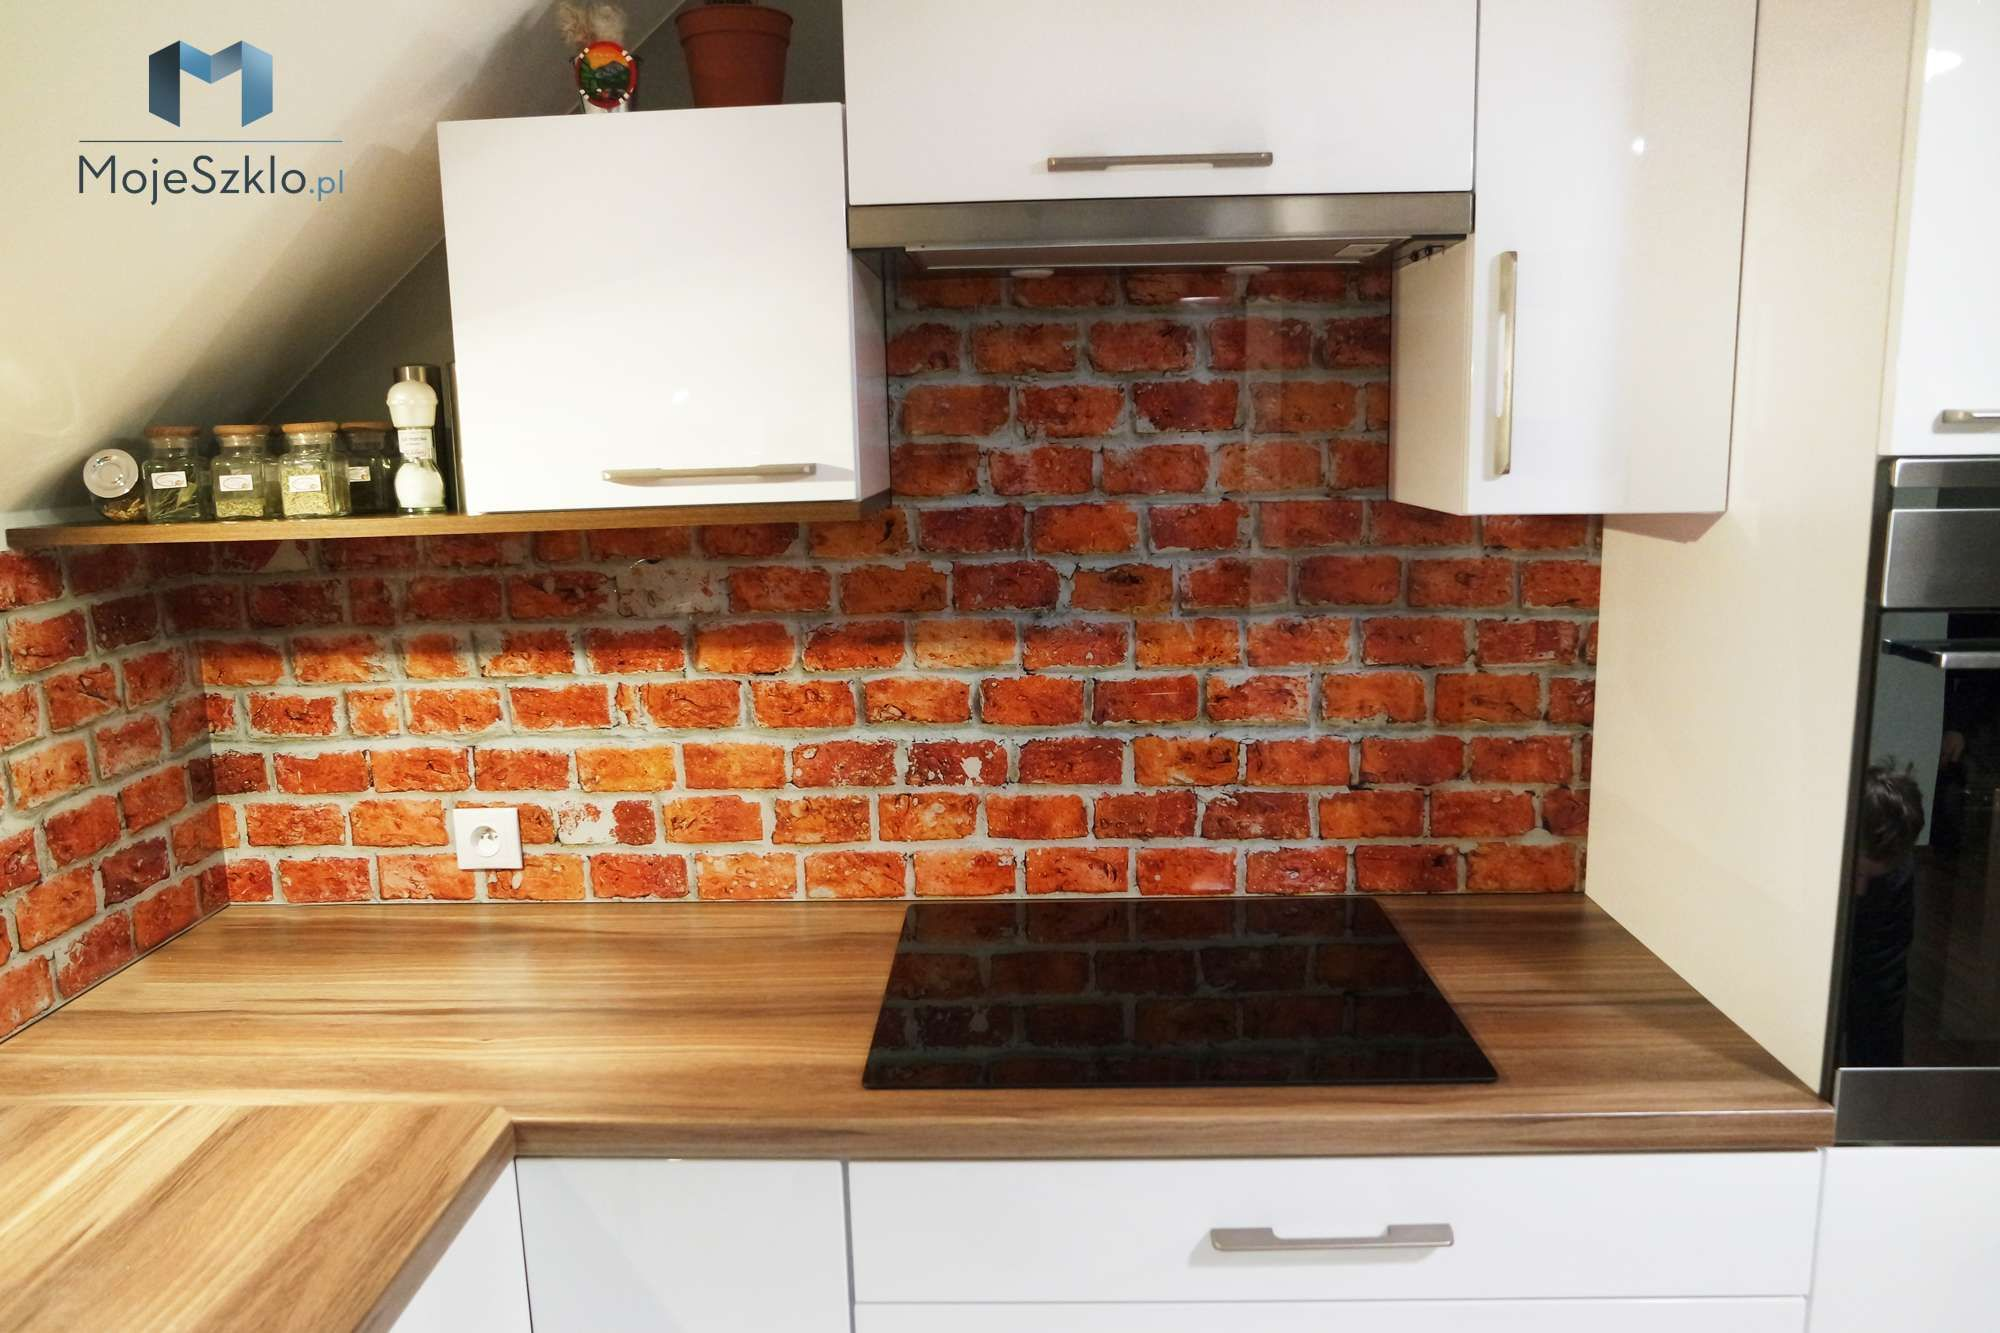 Szklane Panele Cegly Home Decor Flooring Decor